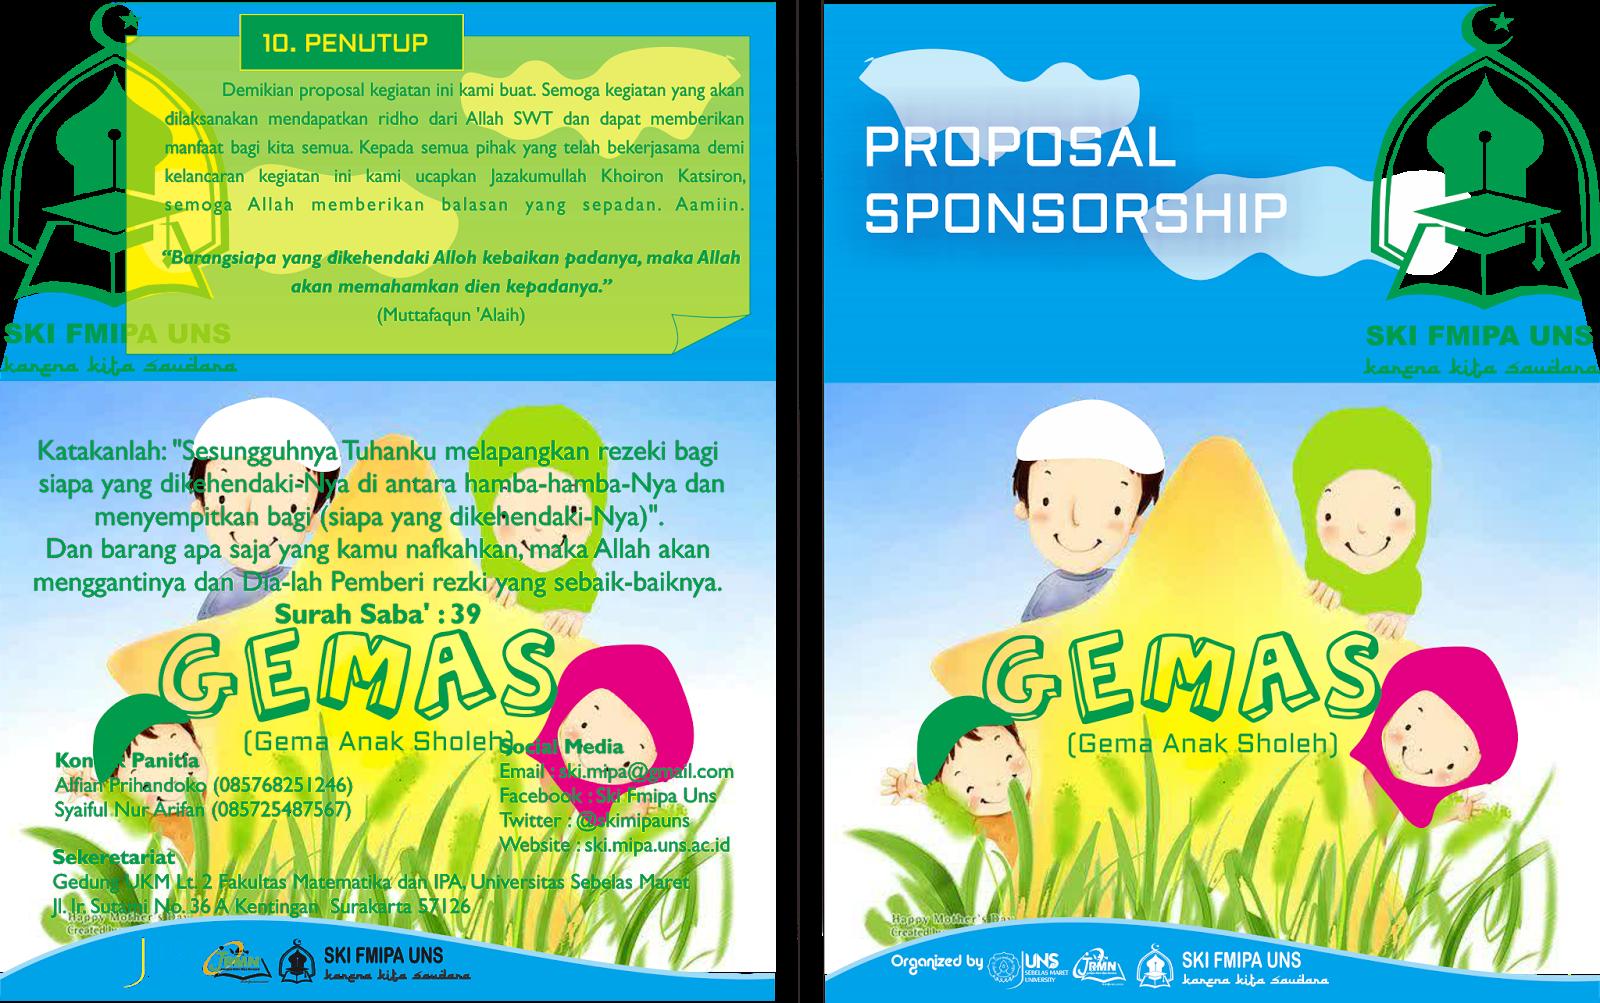 Contoh Proposal Pemasaran Contoh Judul Skripsi Manajemen Pemasaran Cara Buat Proposal Sponsorship Unik Rifan Al Tw